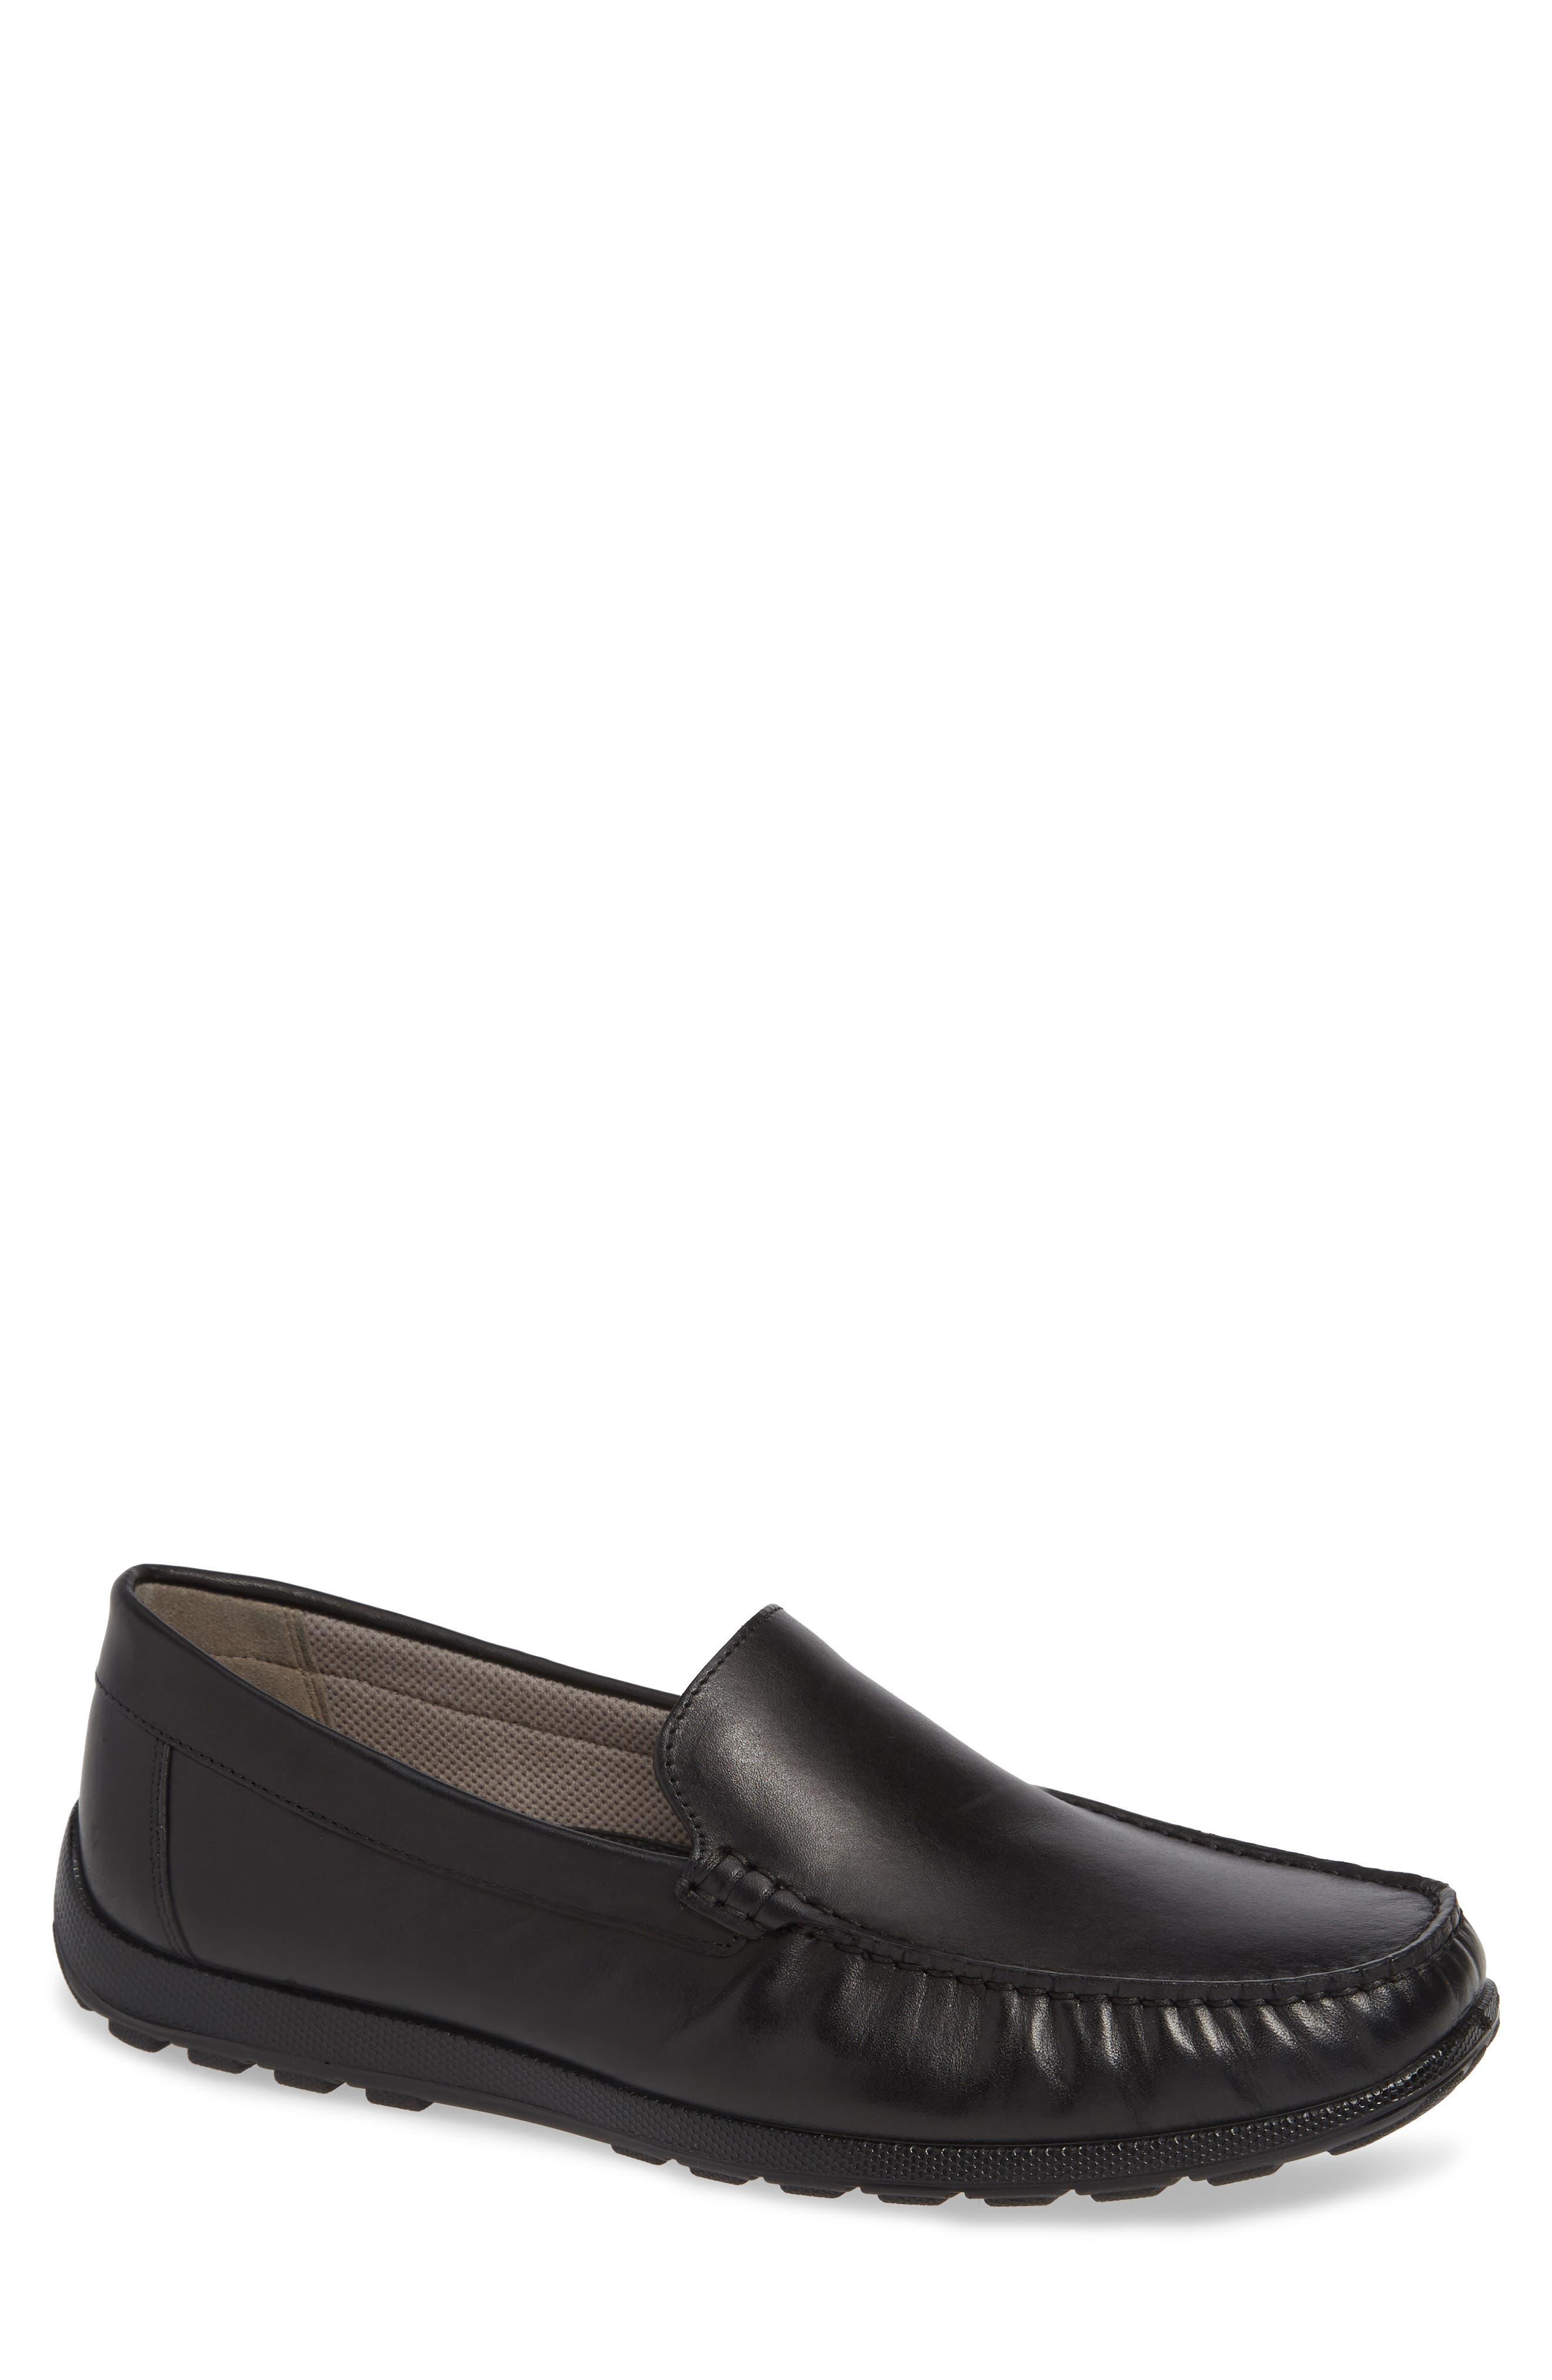 Reciprico Driving Shoe,                             Main thumbnail 1, color,                             BLACK LEATHER